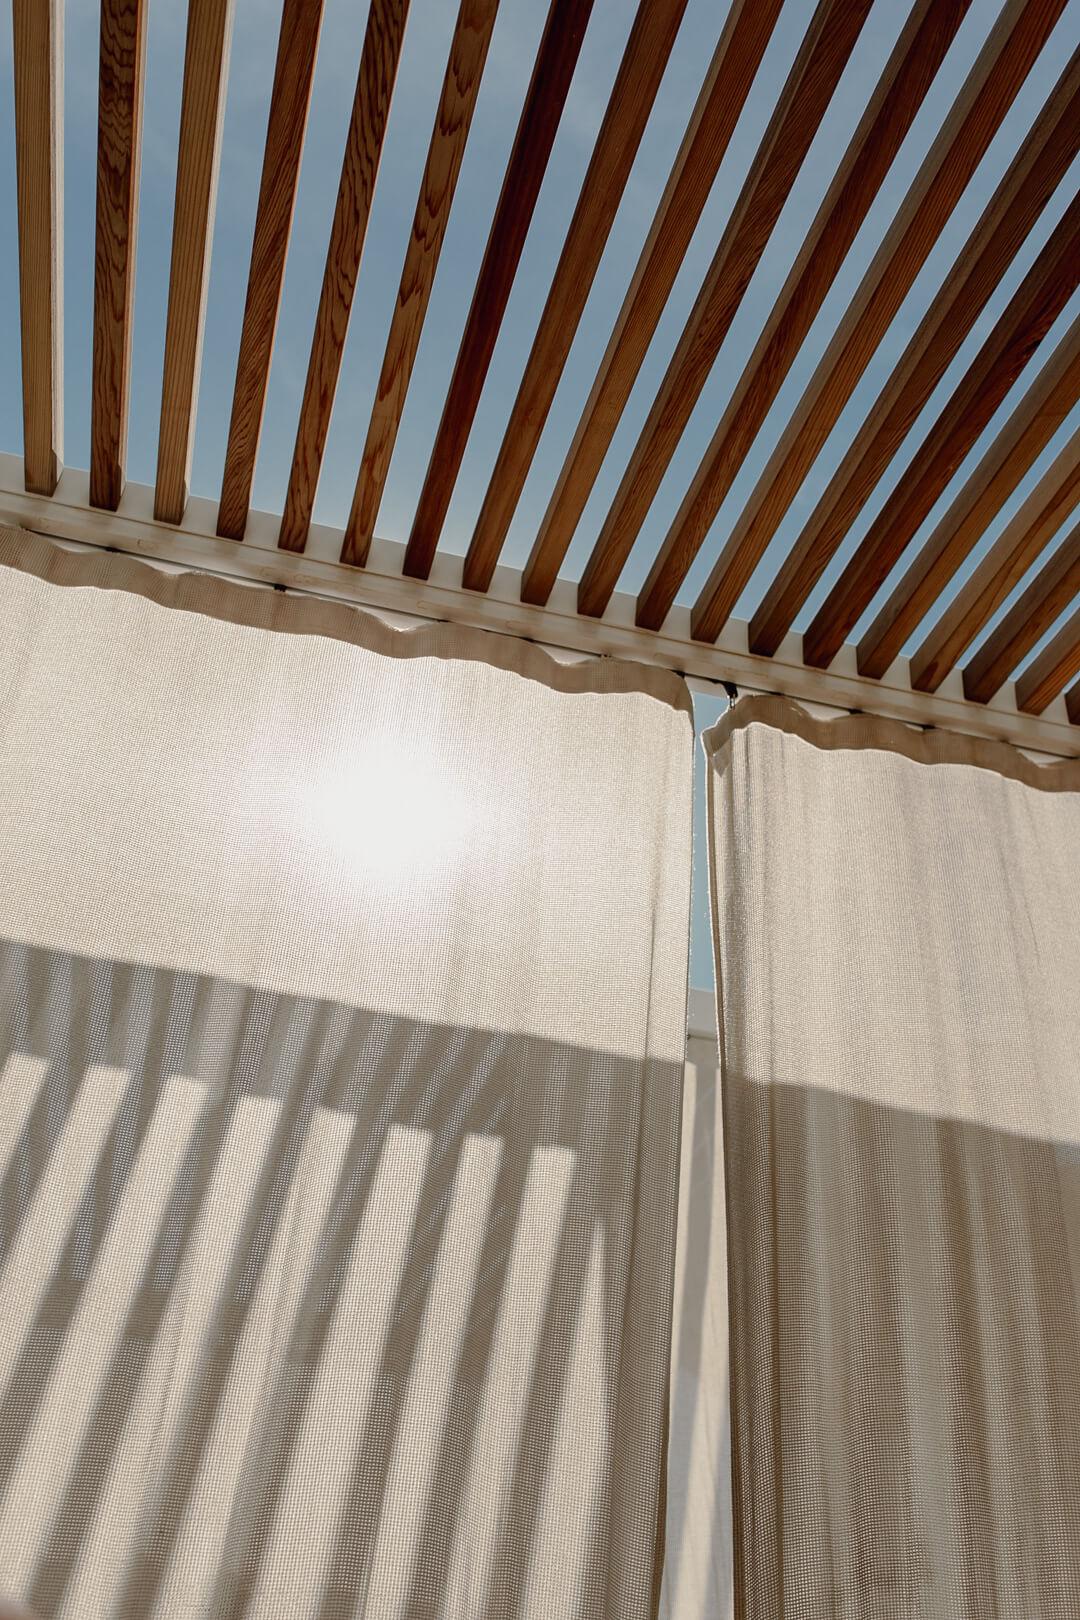 Pool im Al Bandar Rotana Dubai - Pieces of Mariposa // Lifestyle Blog aus Nürnberg